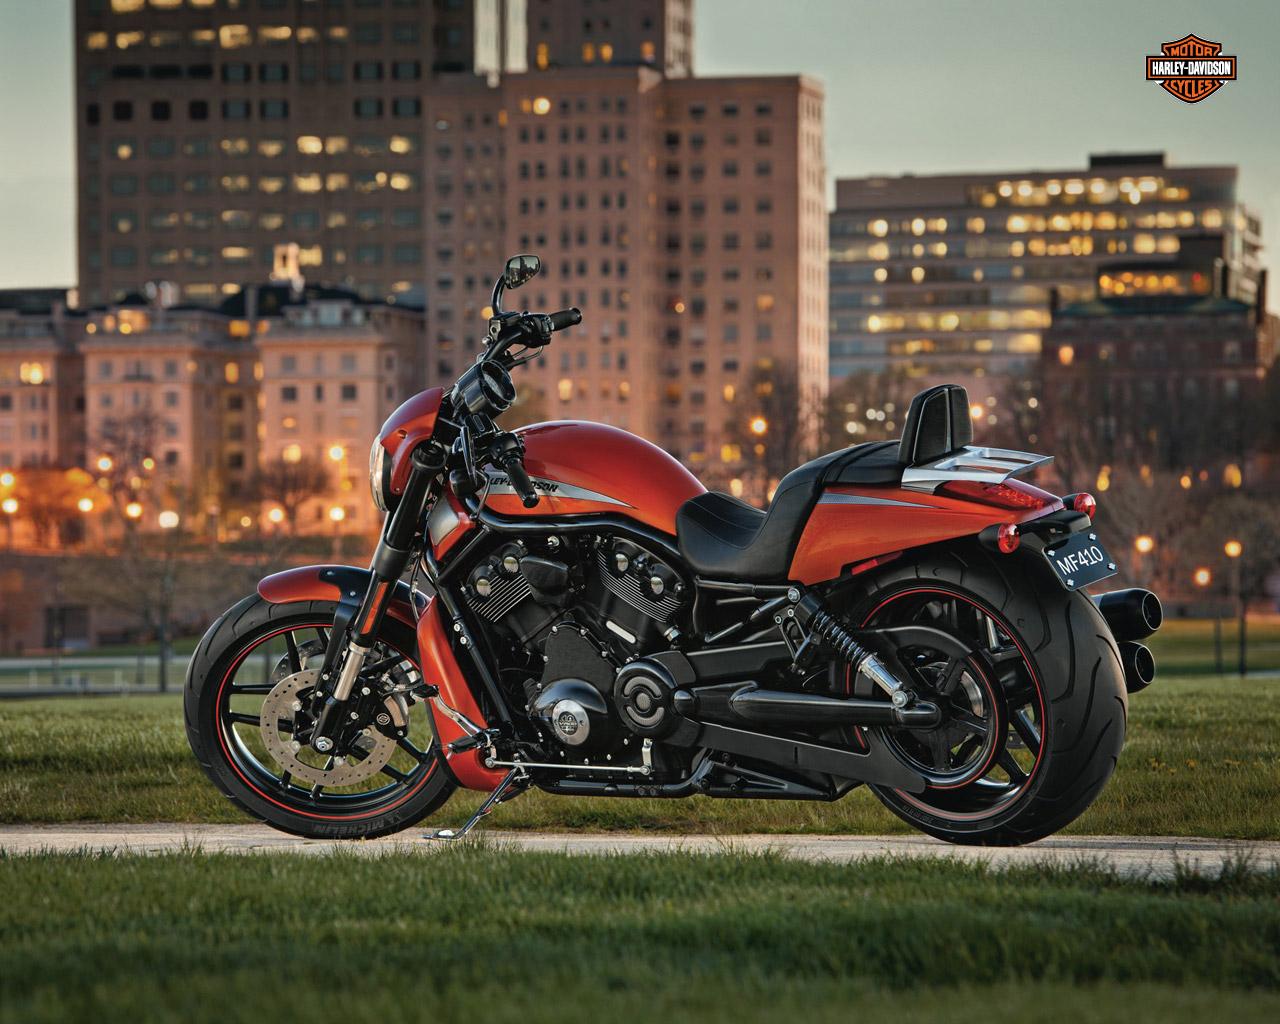 Buy 2012 Harley Davidson Vrscdx Night Rod Special: Harley Davidson: 2012 Harley Davidson VRSCDX Night Rod Special